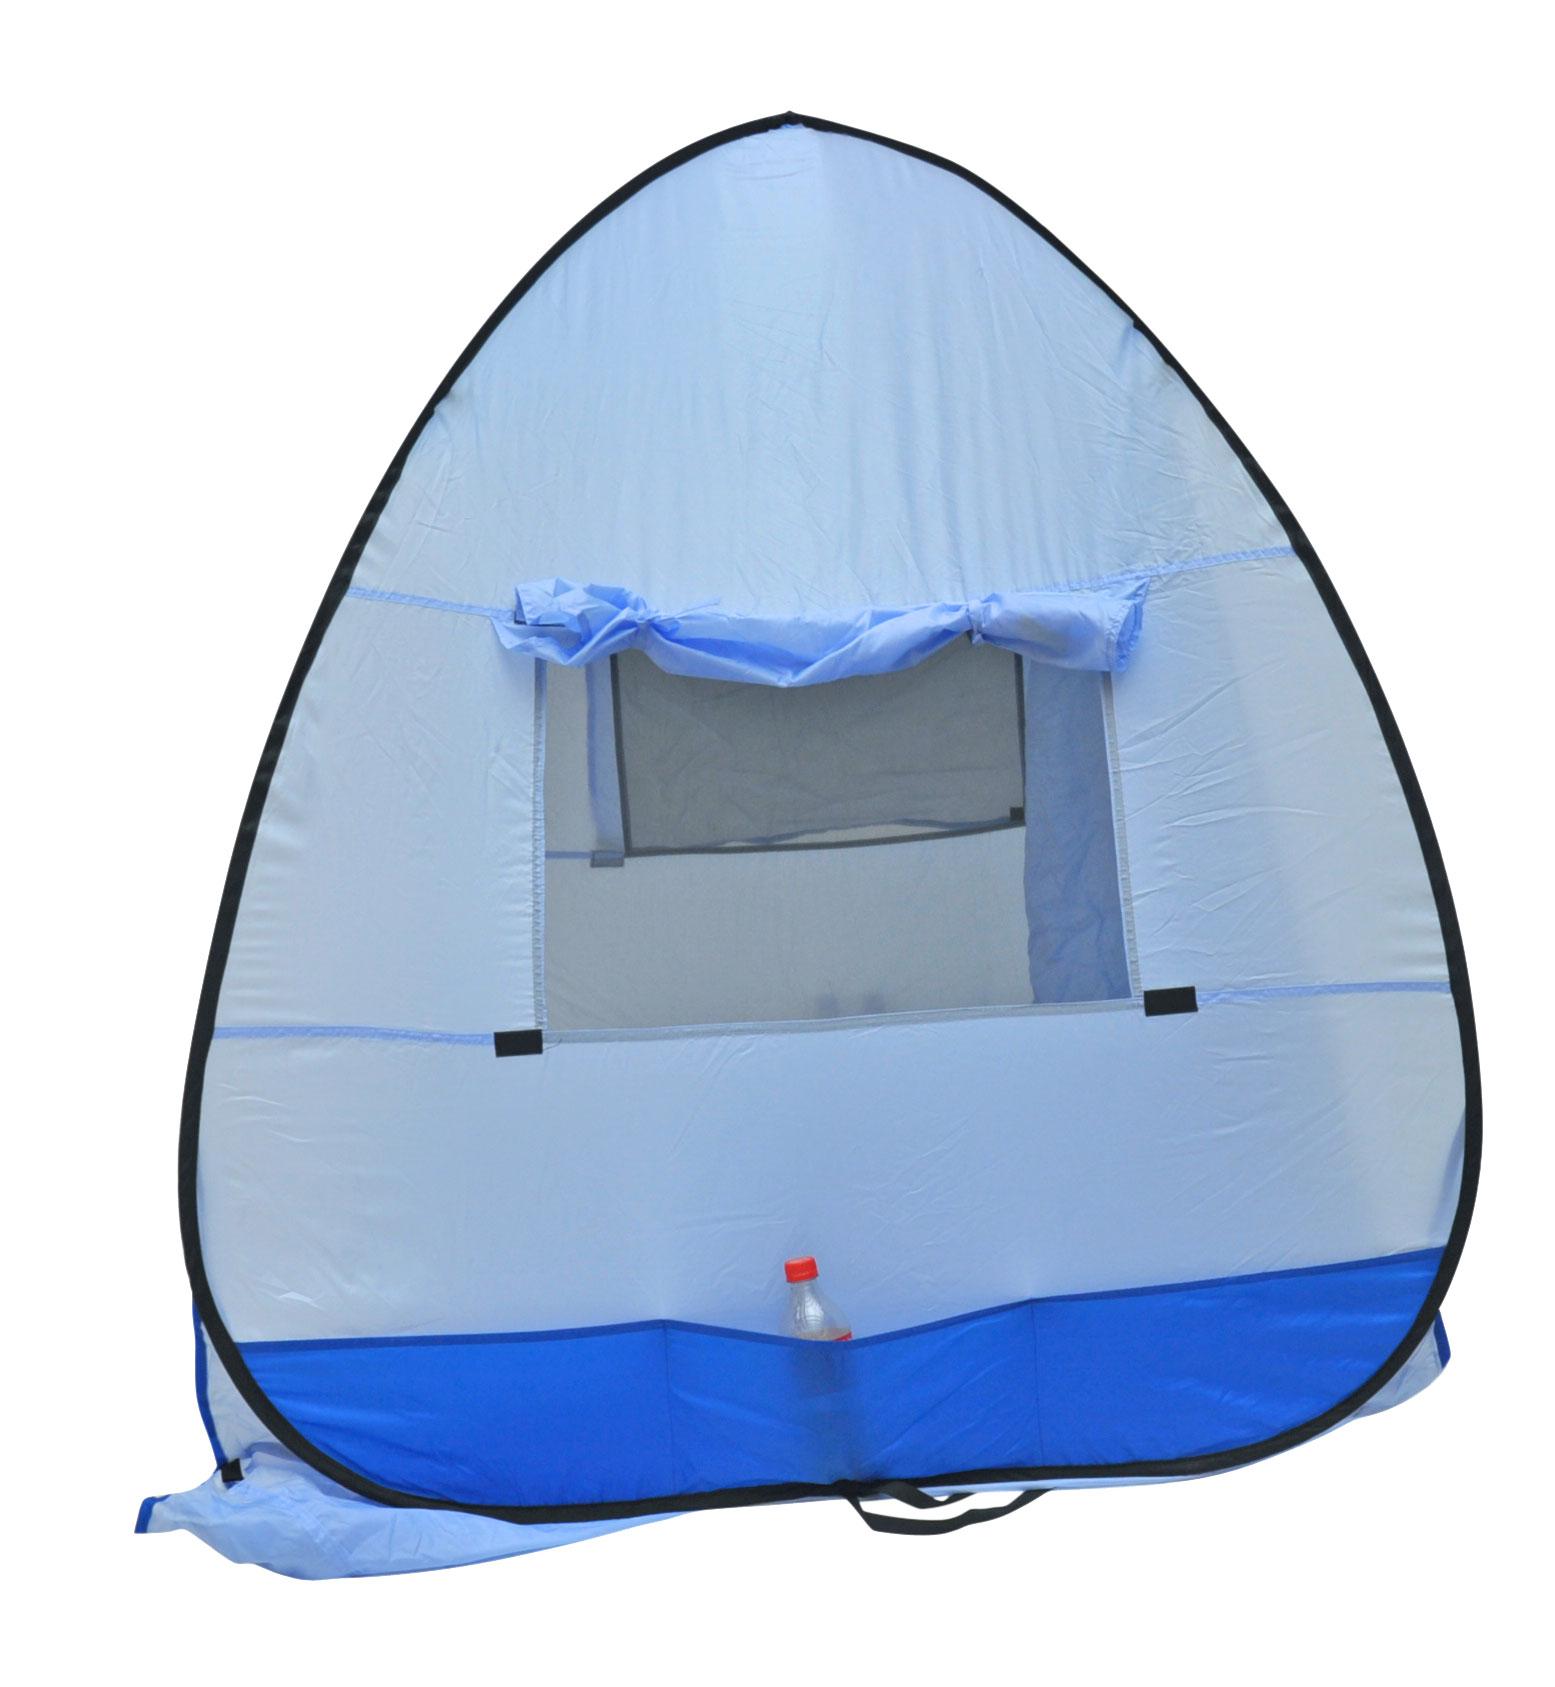 Instant-Pop-up-Family-Beach-Tent-Cabana-Shade-and-Sun-Shelter-UPF-55 thumbnail 8